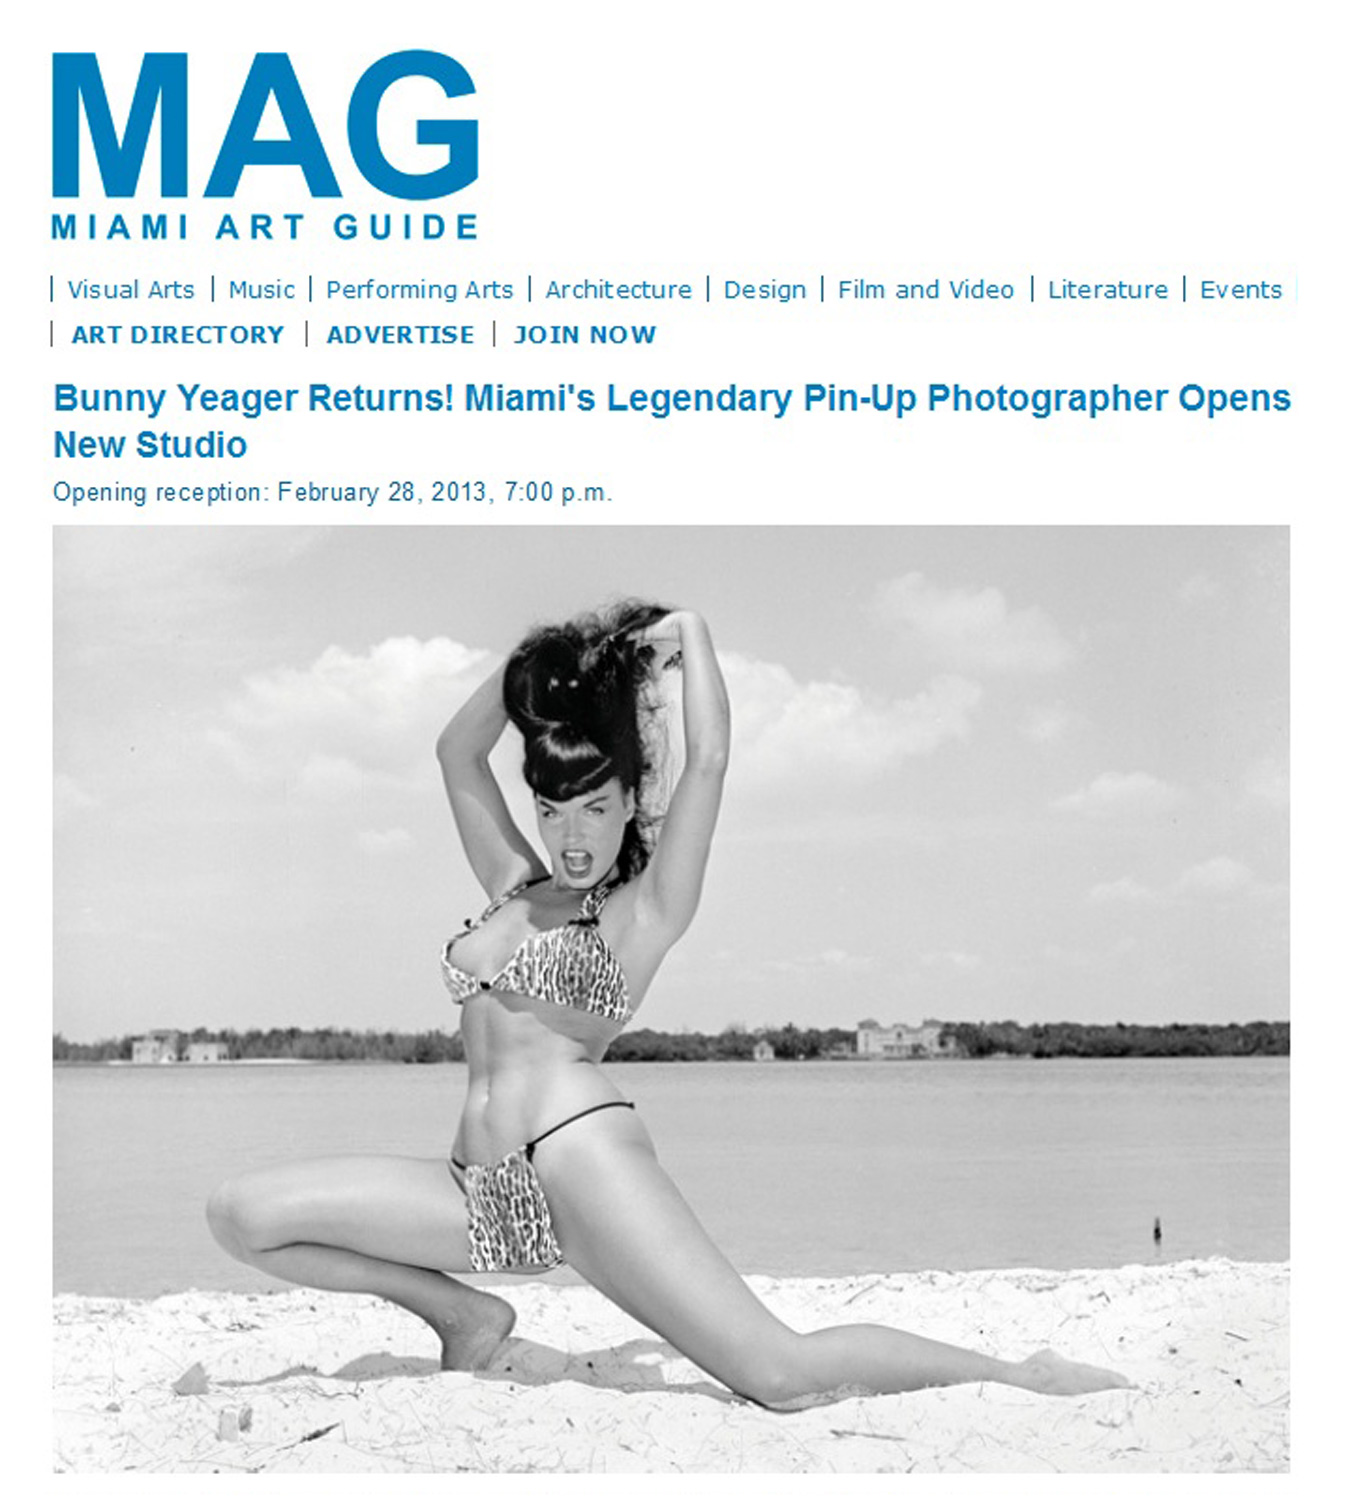 MAG-Screen-Shot-BY-2-28-13-300k